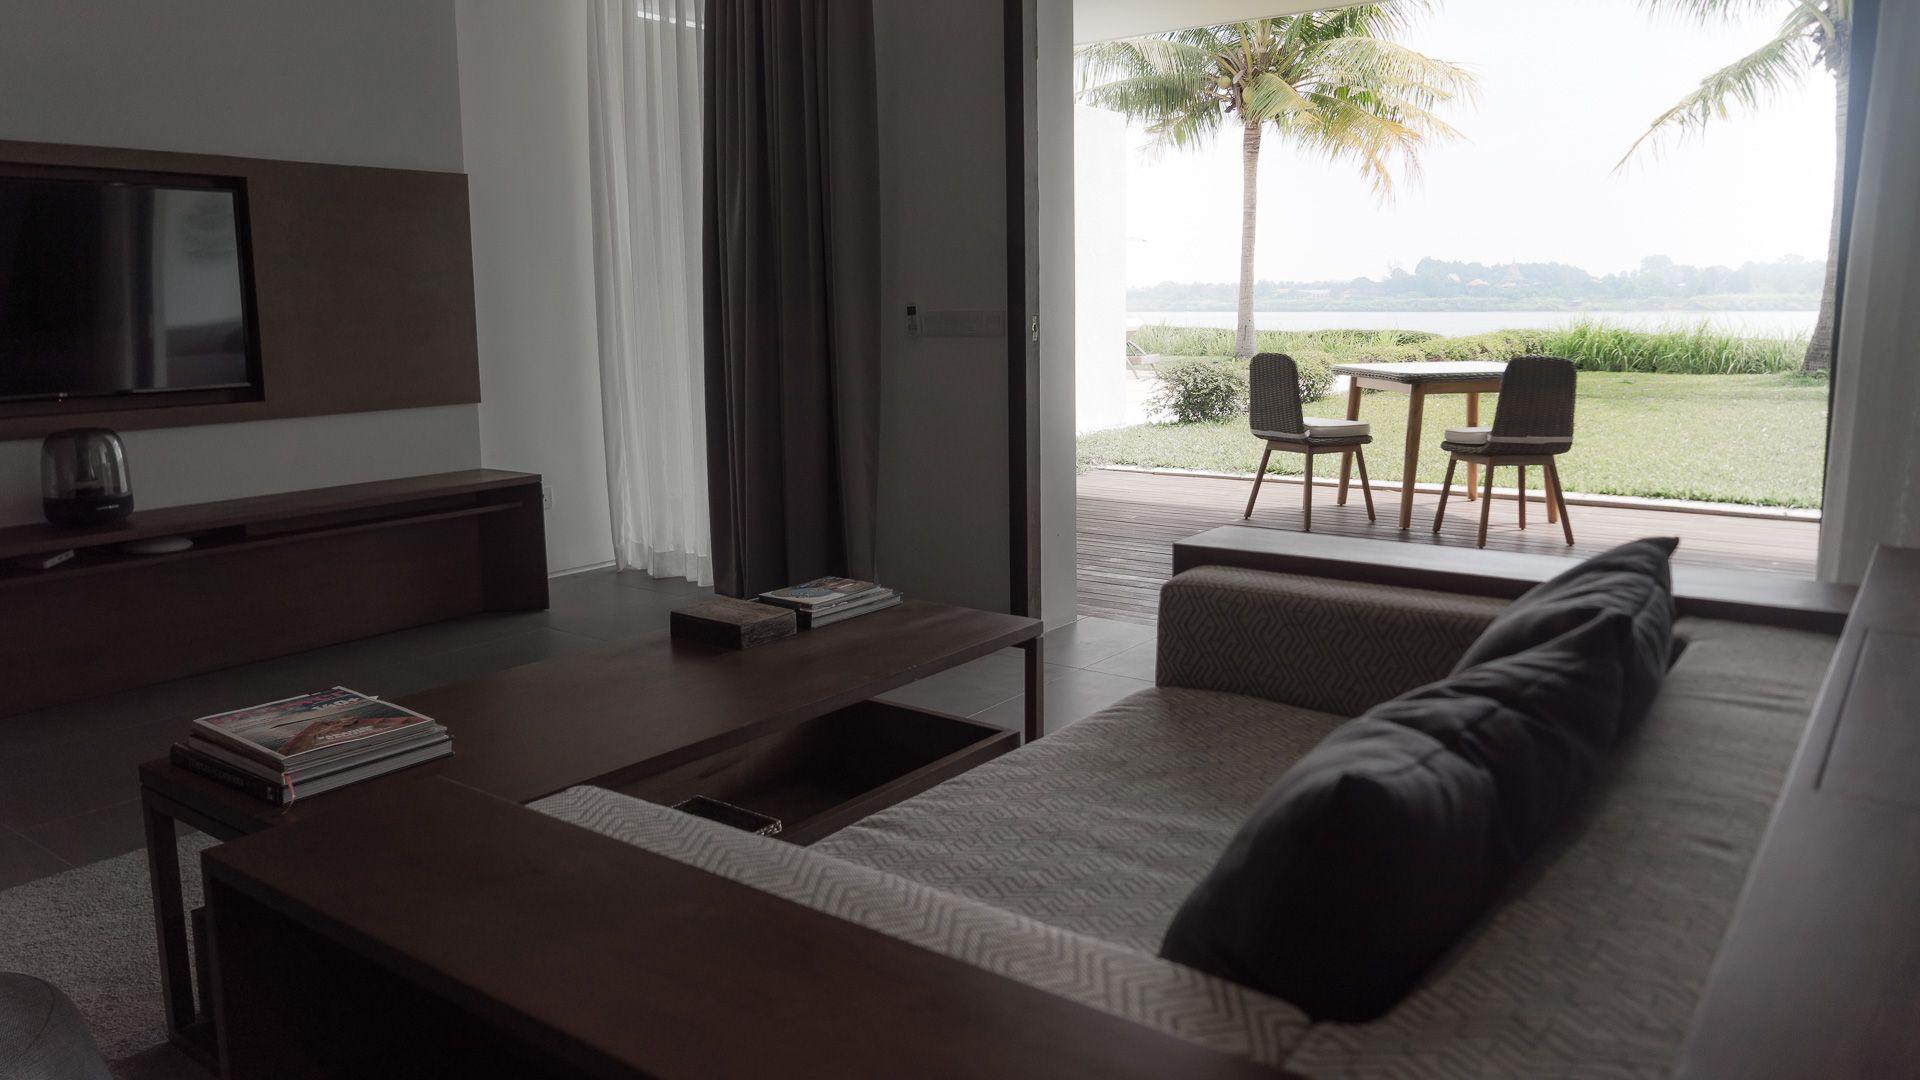 Lesvoyageuses-voyage-Phnom-Penh-cambodge-hotel-the-bale-experience-23